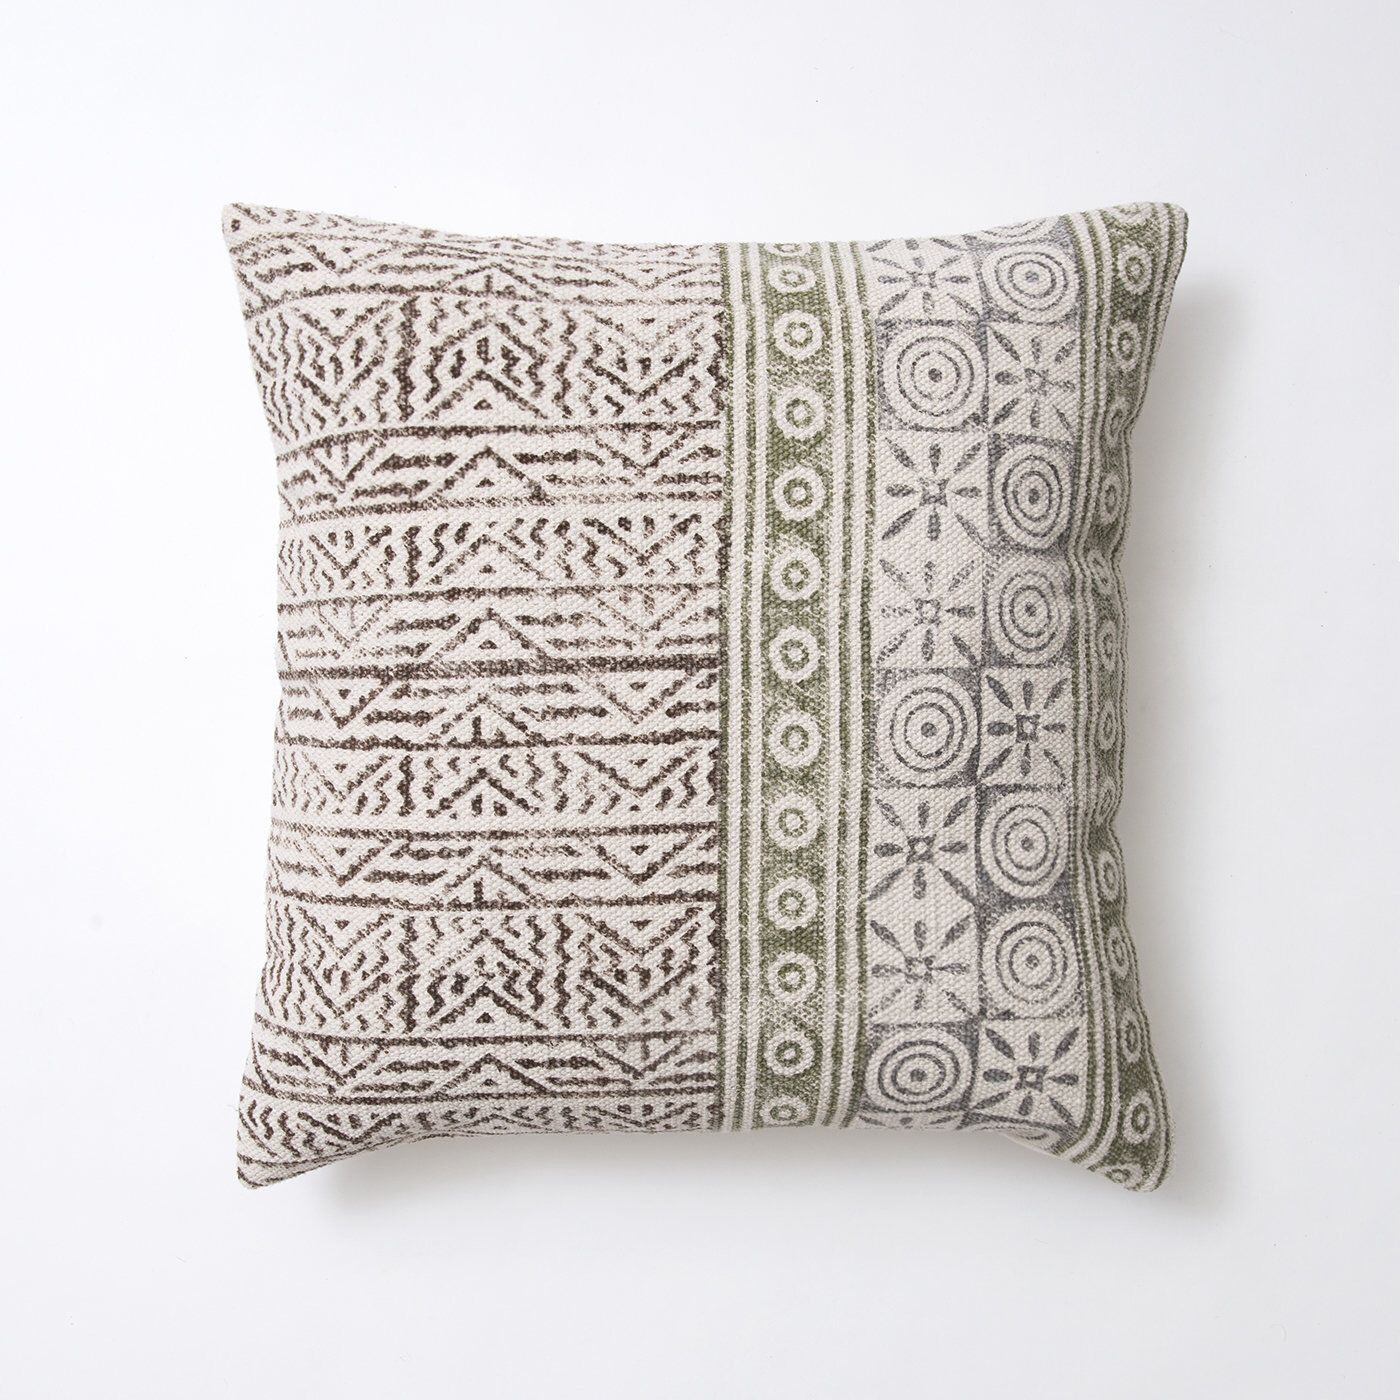 Handmade Indian Cotton Dhurrie 20 X 20 Throw Etsy Rustic Pillows Printed Cushion Covers Printed Cushions